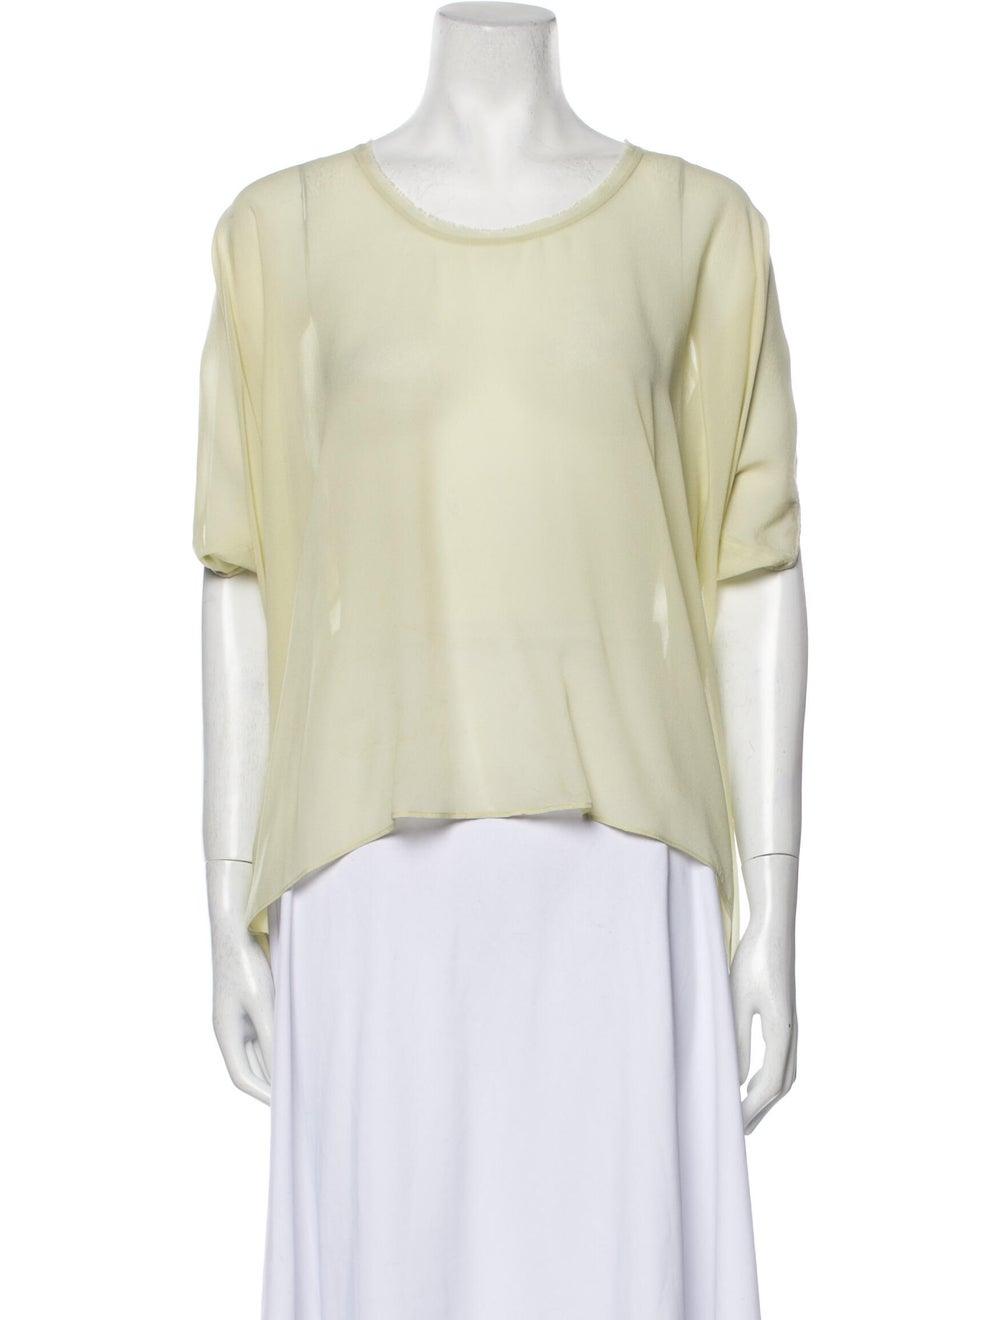 Helmut Lang Silk Scoop Neck T-Shirt Green - image 1